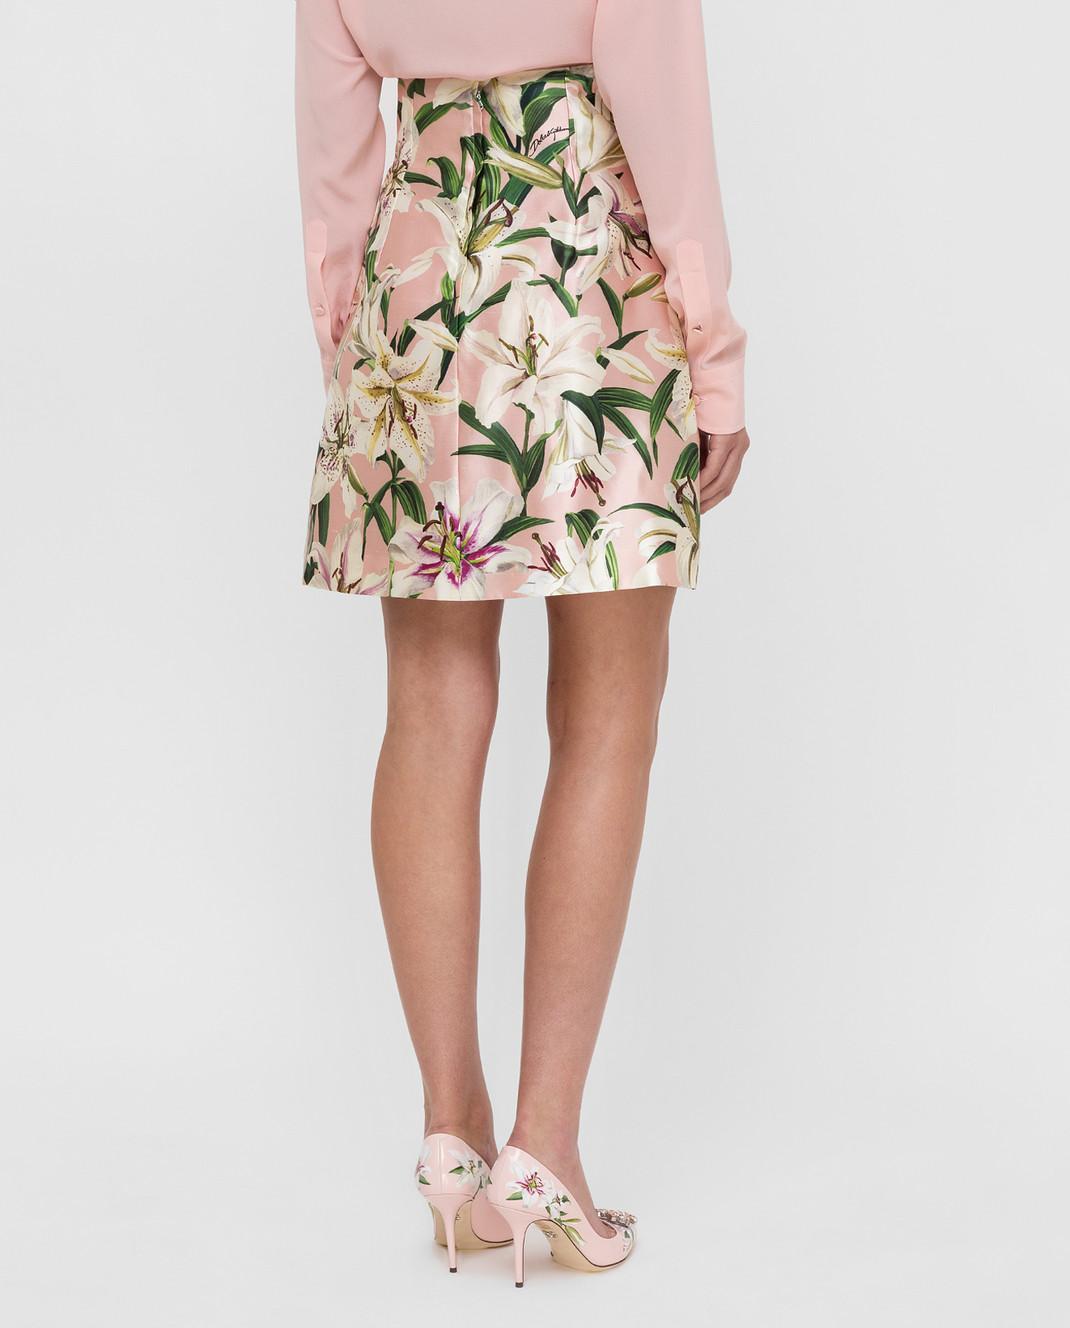 Dolce&Gabbana Розовая юбка из шелка F4BOLTHS149 изображение 4